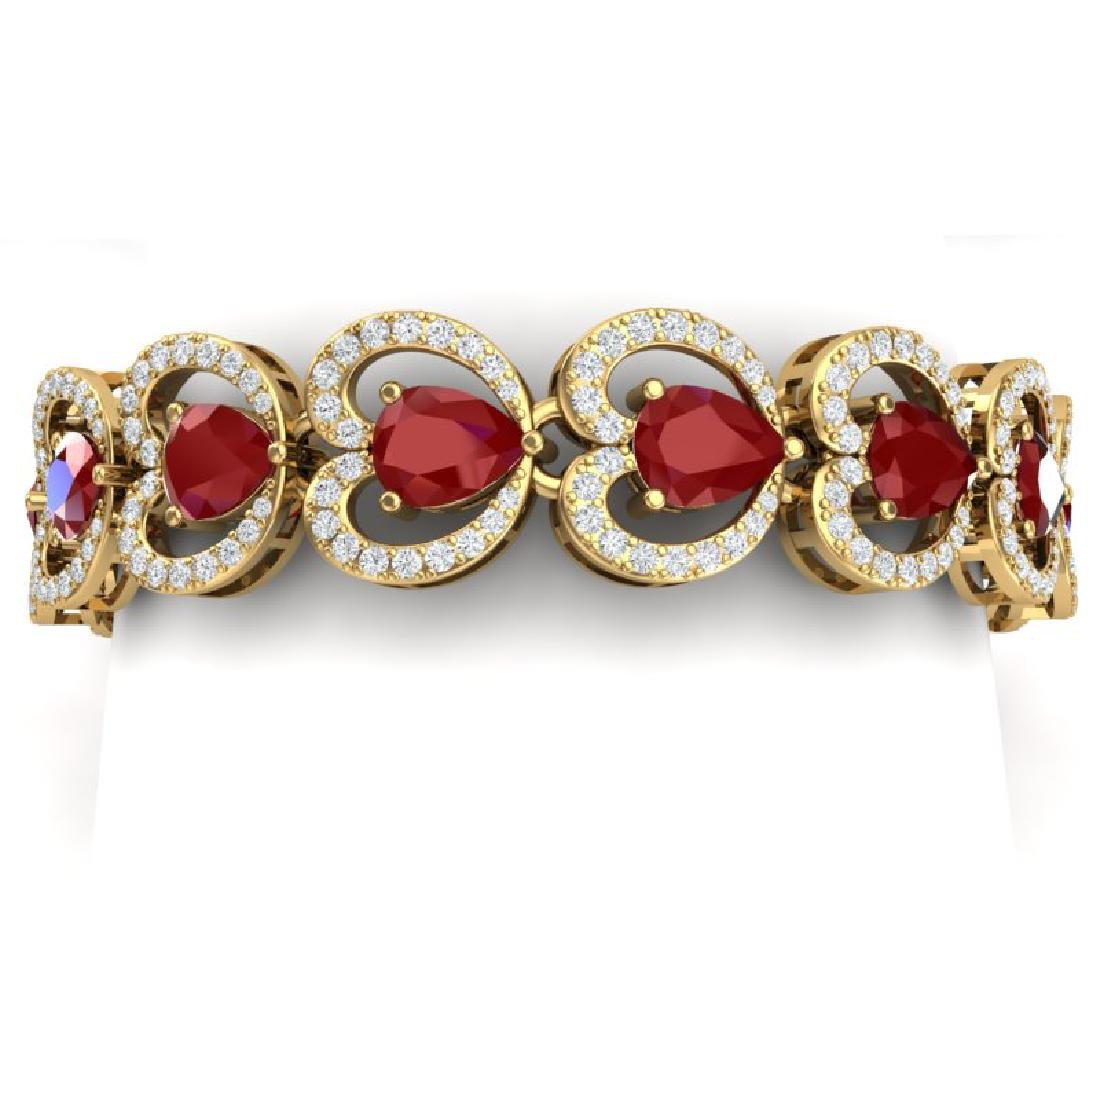 32.15 CTW Royalty Ruby & VS Diamond Bracelet 18K Yellow